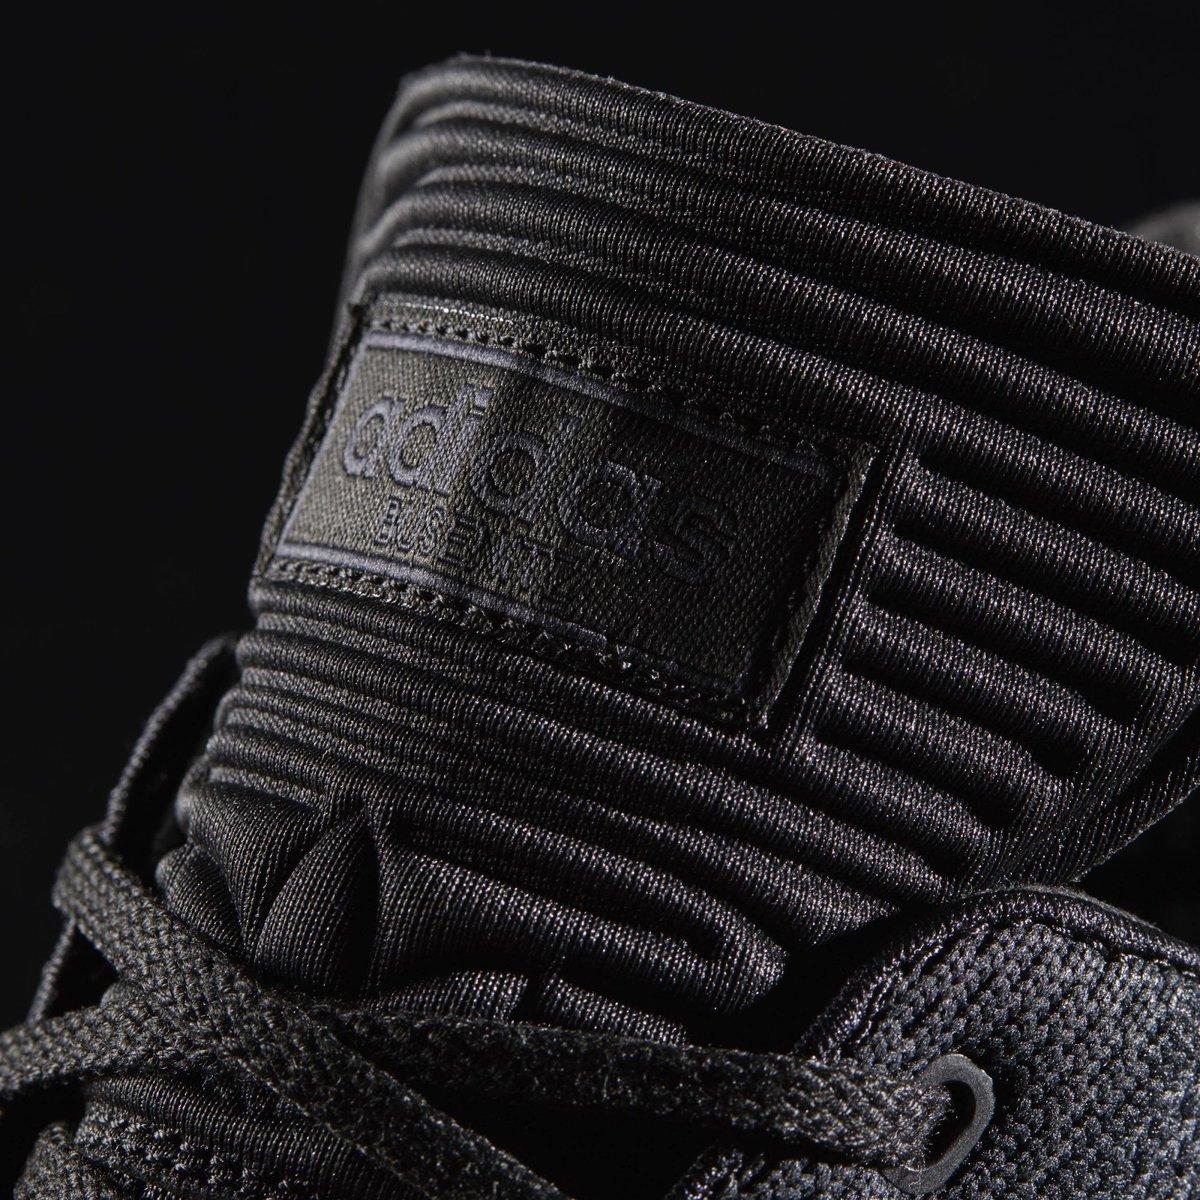 adidas Busenitz Pure Boost Primeknit Triple White   Style